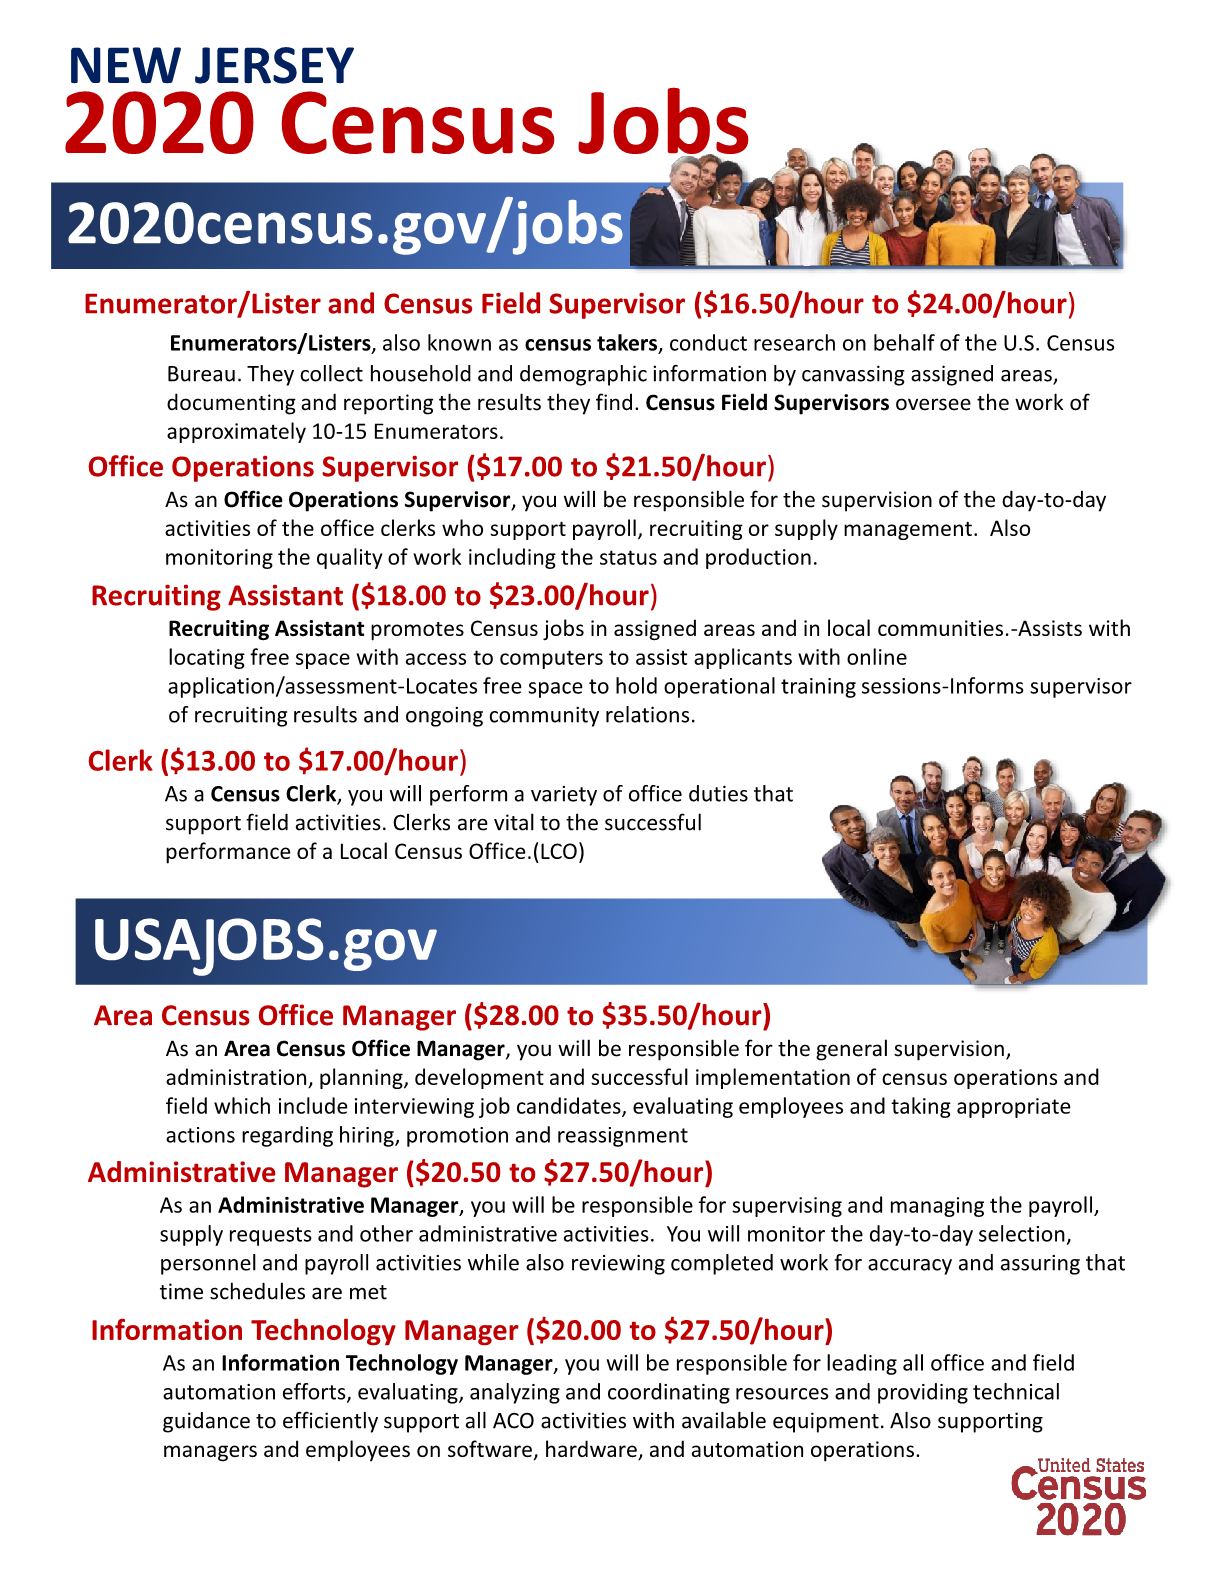 New Jersey 2020 Census Jobs